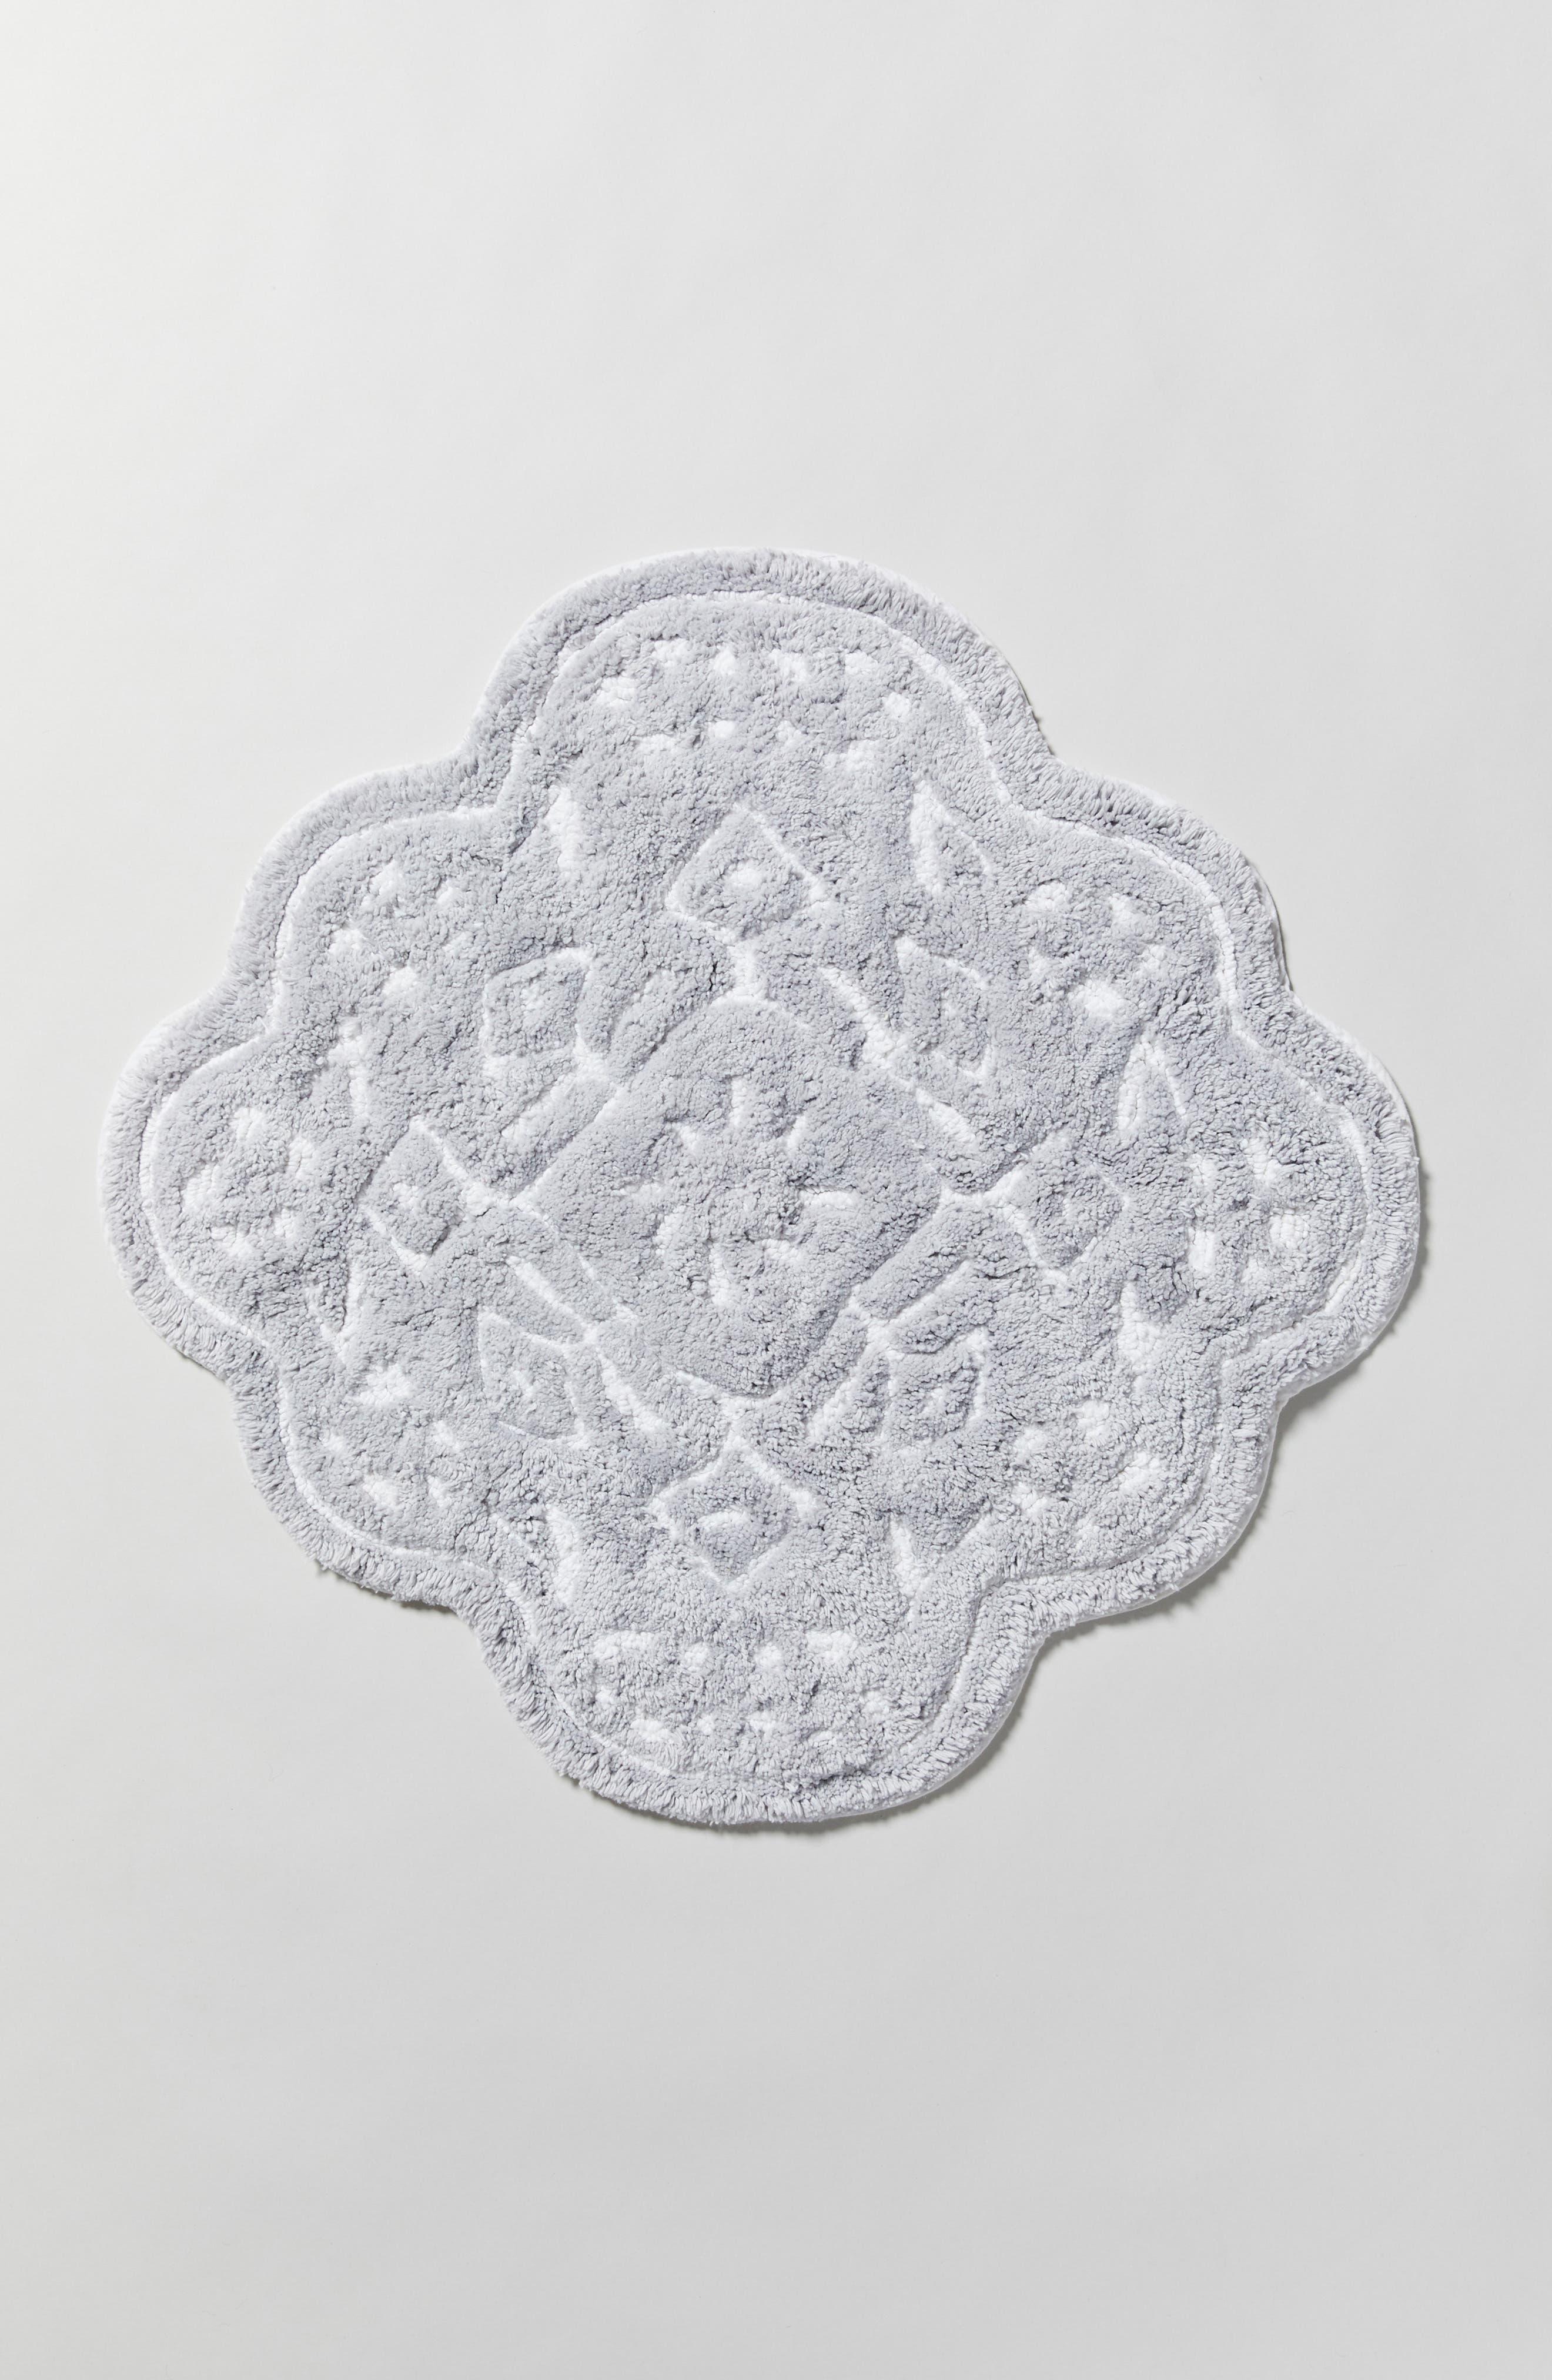 ANTHROPOLOGIE, Mosaic Tile Bath Mat, Alternate thumbnail 4, color, GREY